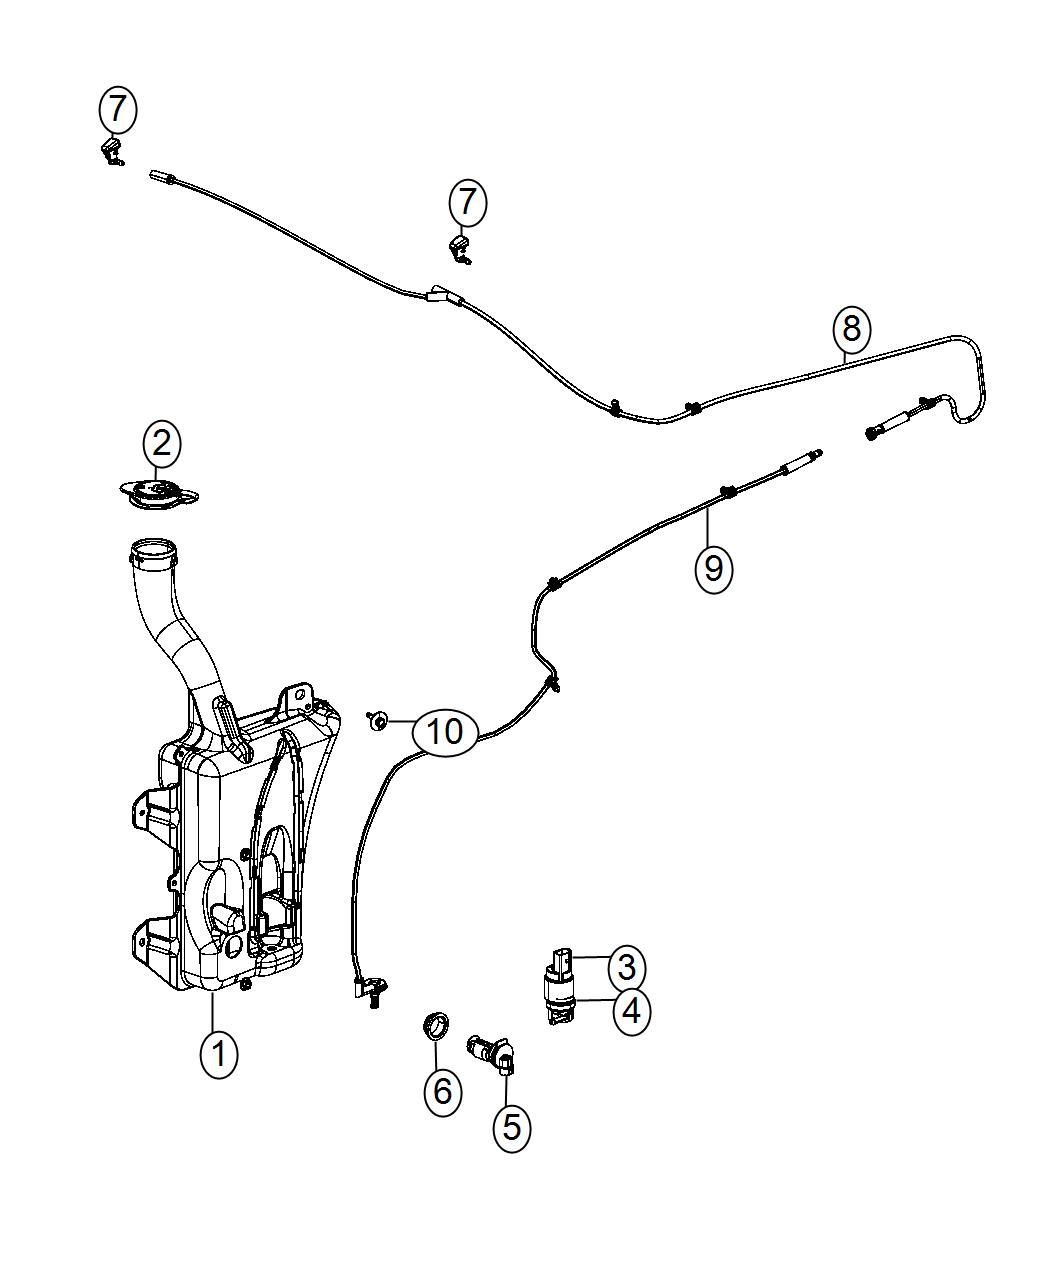 2016 Dodge Dart Grommet. Windshield washer pump. Front